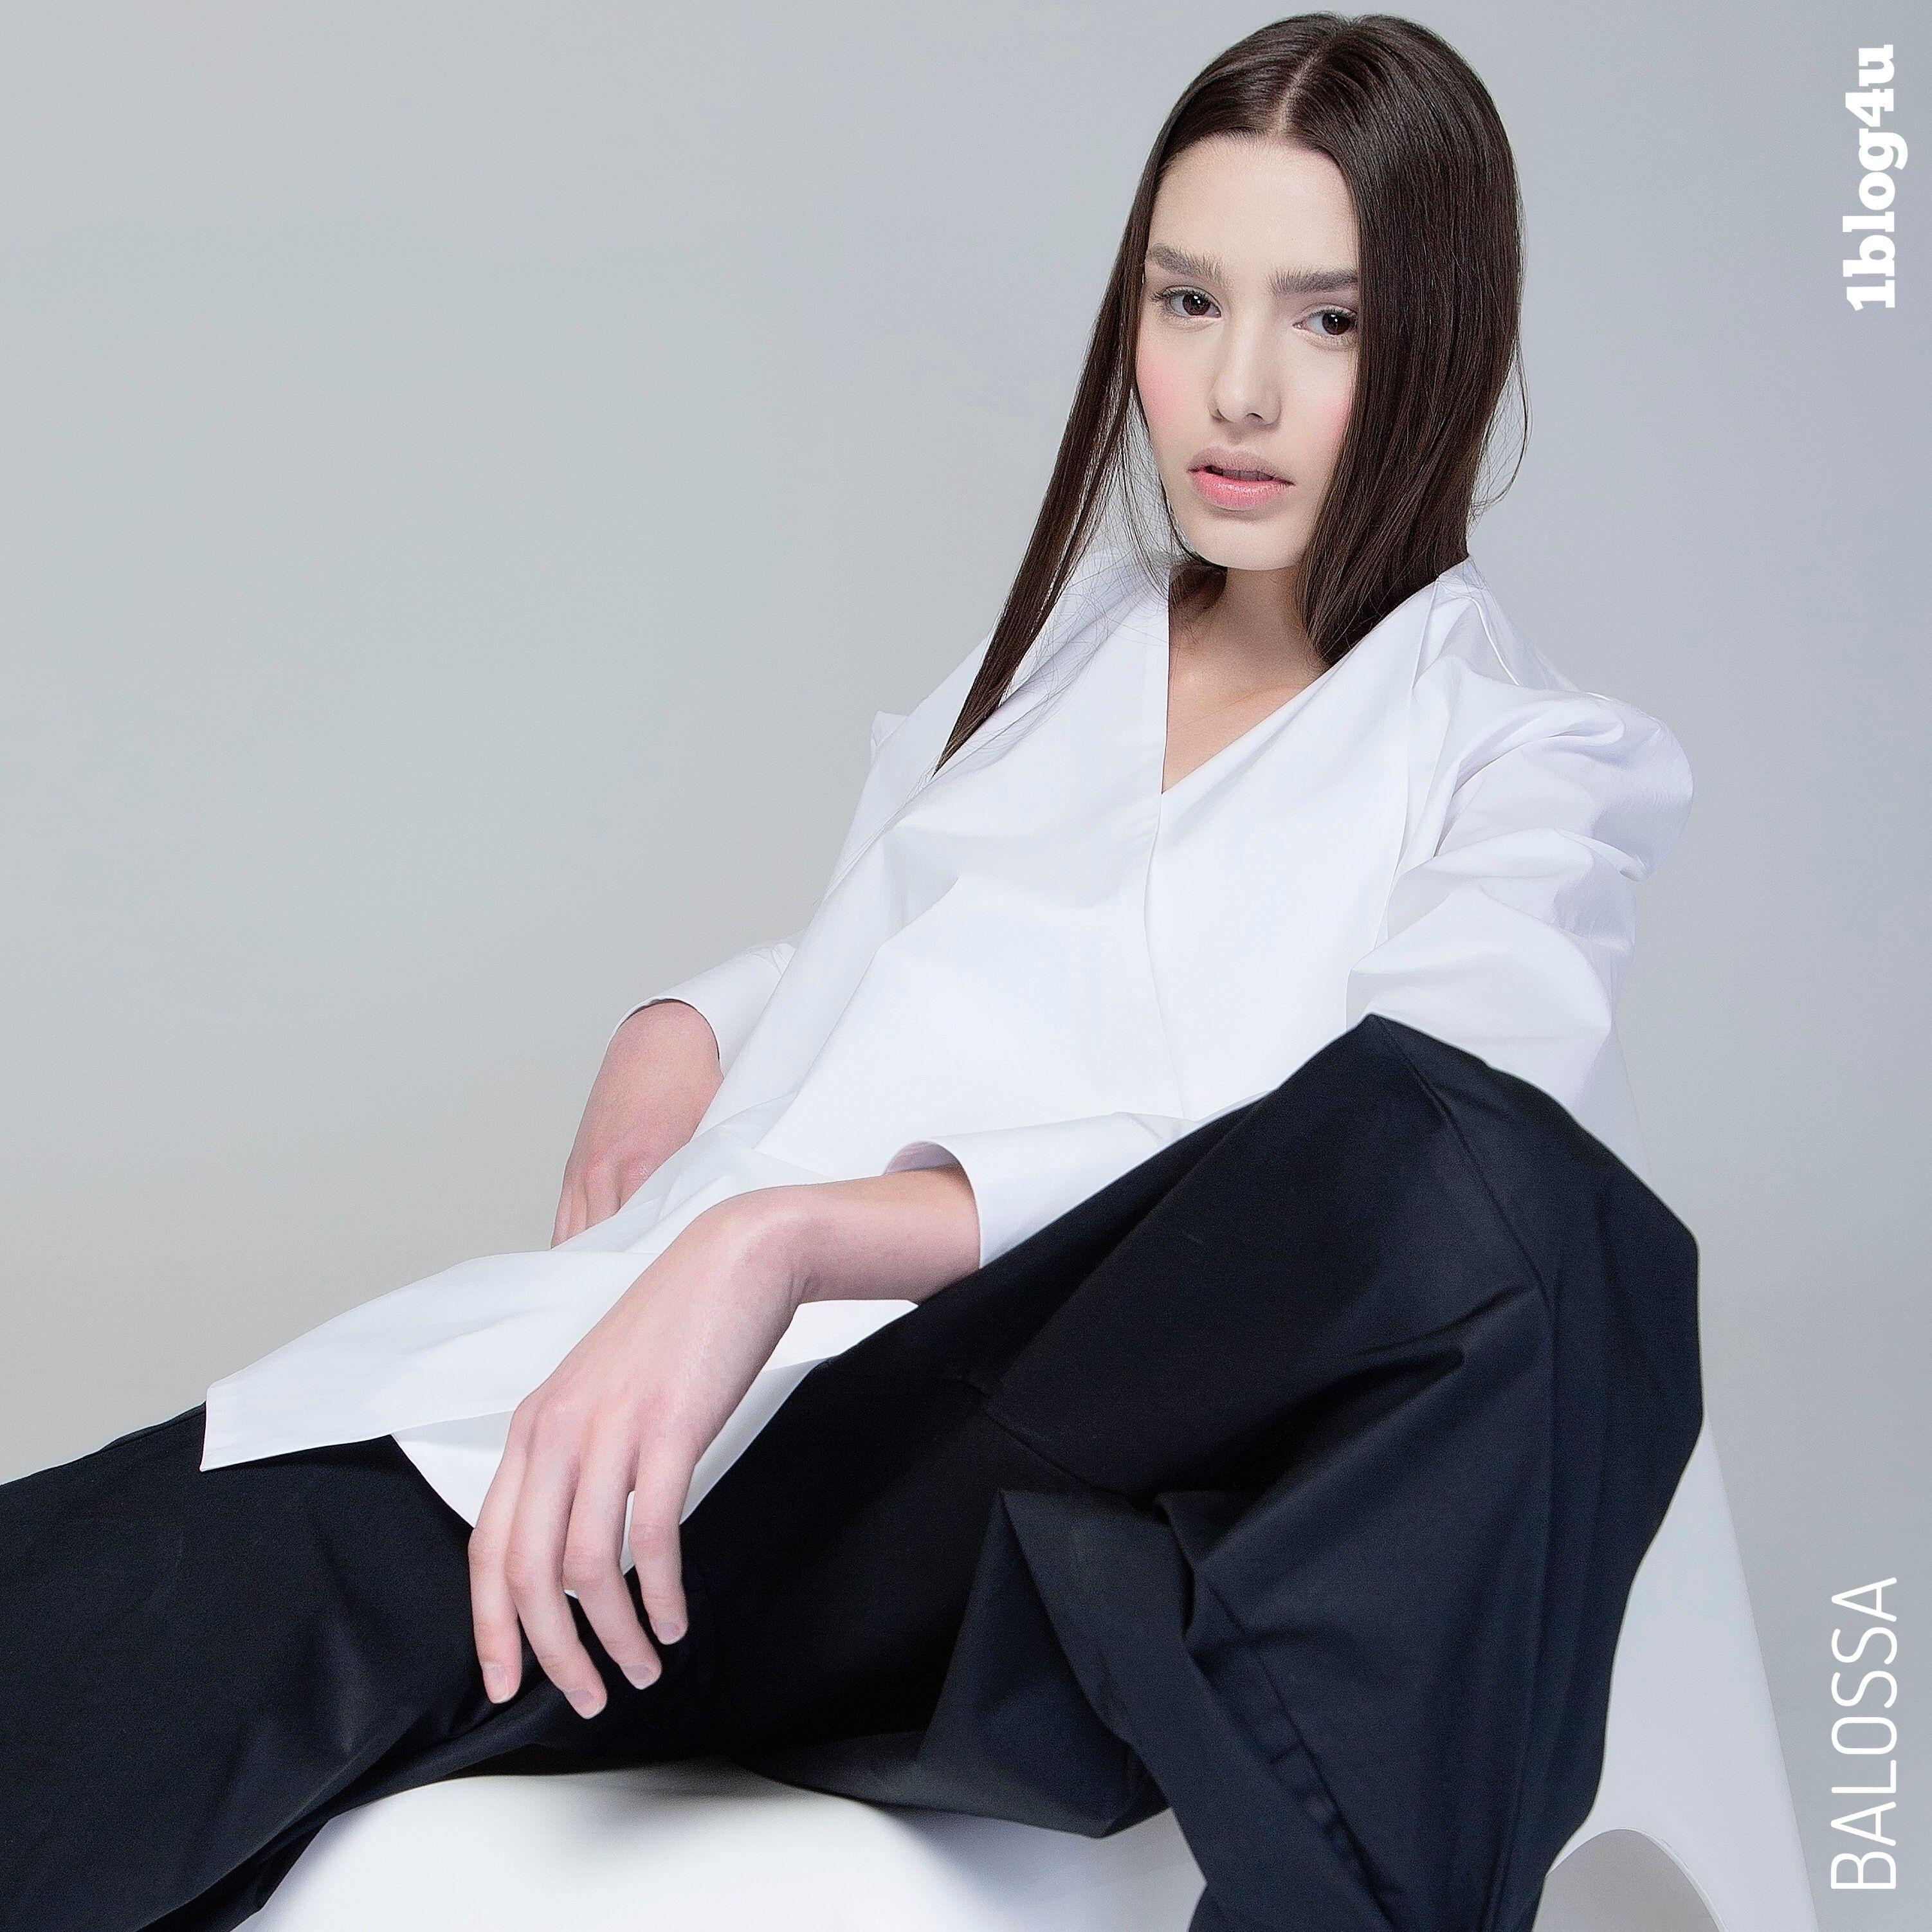 #balossa #white #shirt lovely Italian brand by #fashion #designer #Indra #Kaffemanaite - #collection for #SS2018 #camicia #shirt #springsummer18 #SS18 #MFW #NYFW - #Cristina #Vannuzzi for #1blog4u  - #Gabriella #Ruggieri #blogger #blogging #fashionblogger